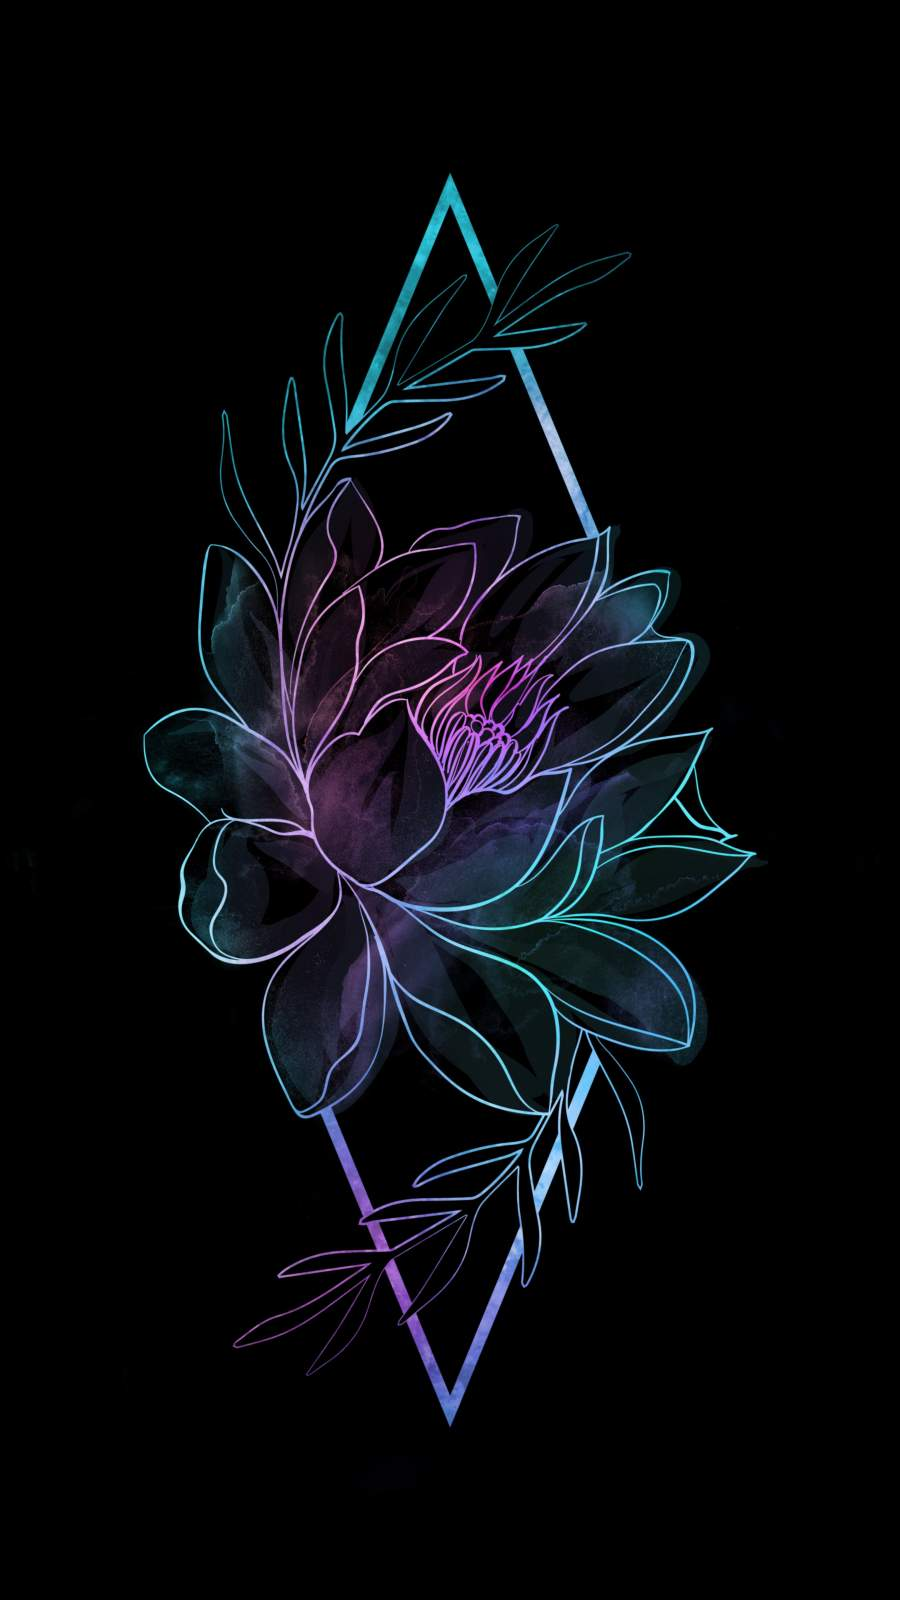 Amoled Flower iPhone Wallpaper